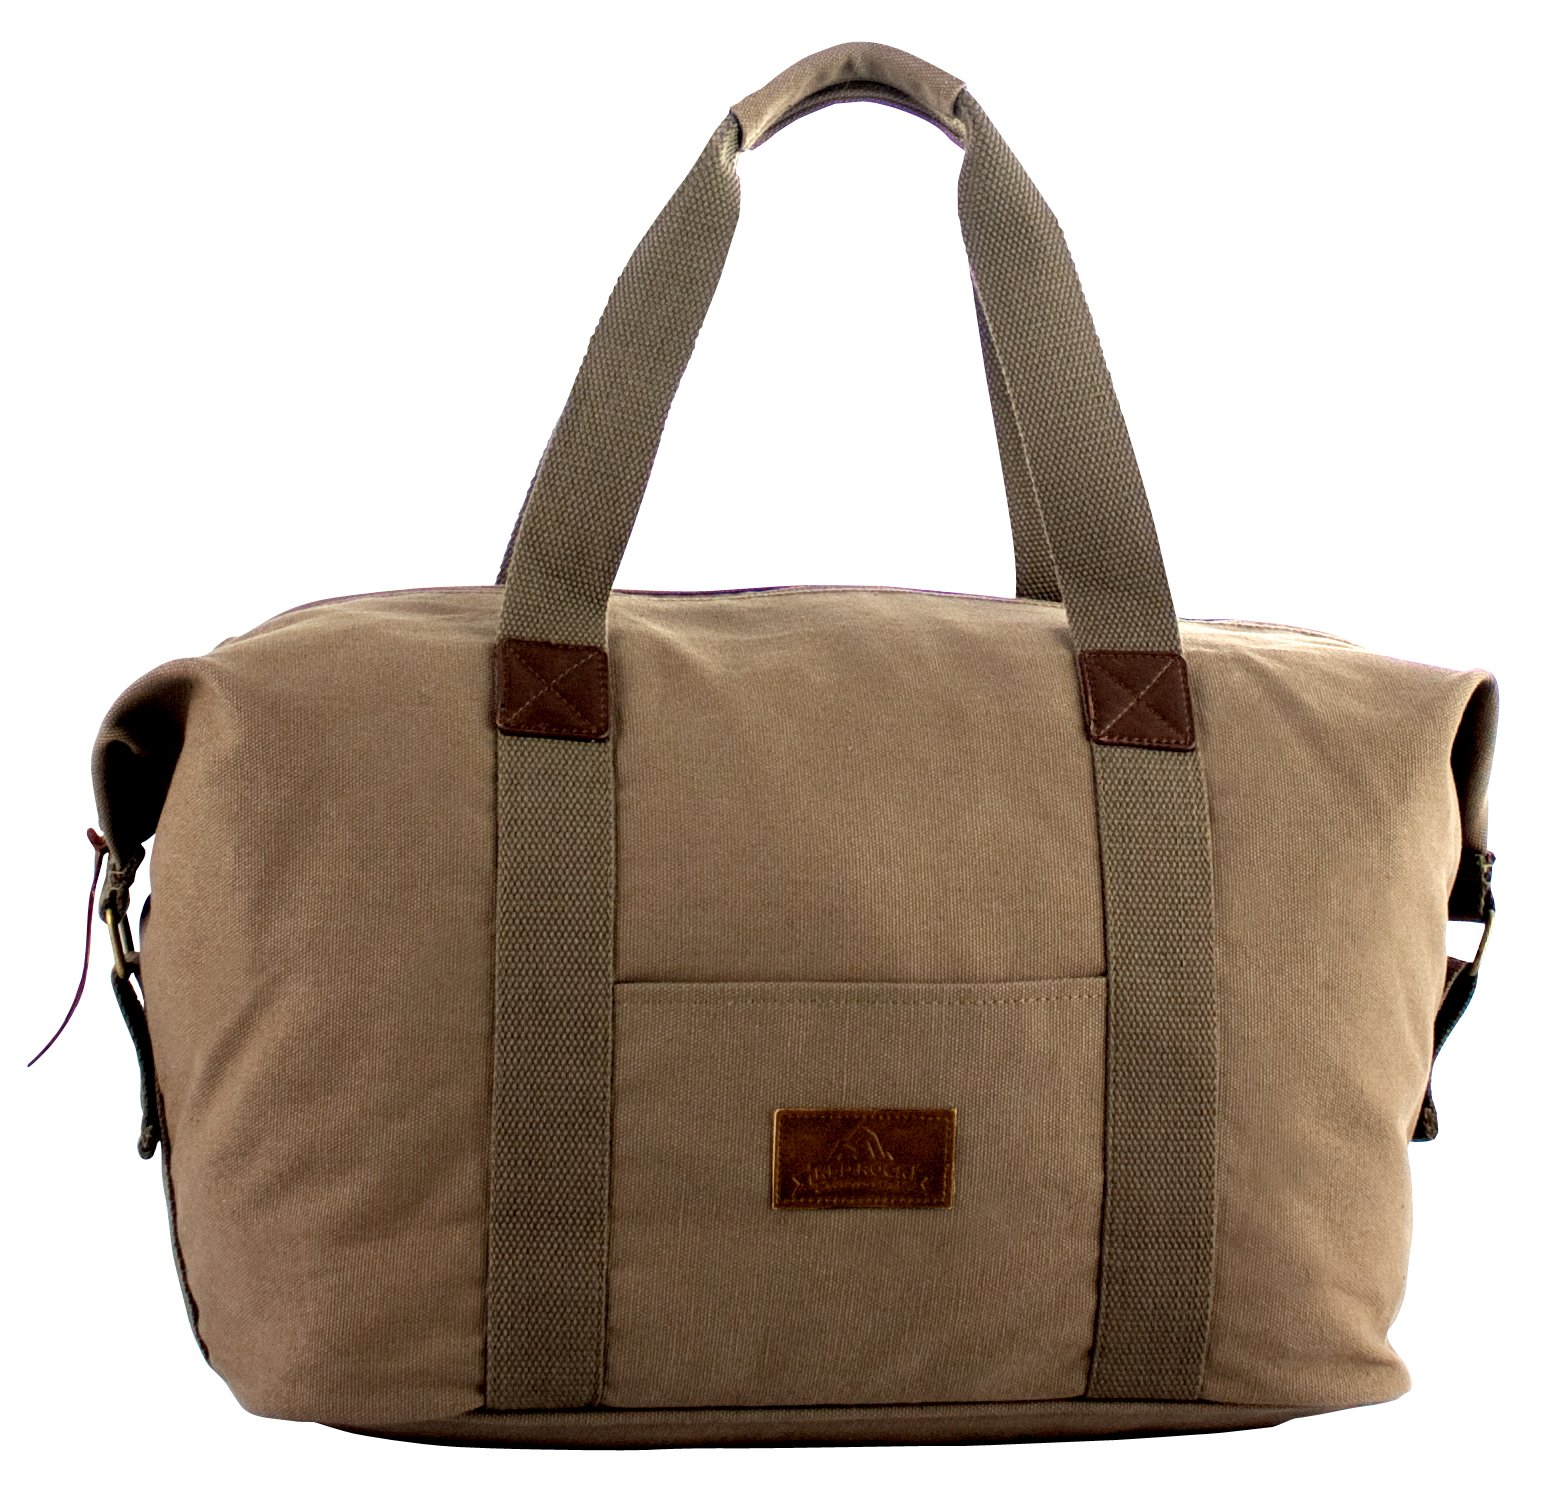 Red Rock Outdoor Gear Hunter Carry Bag, Khaki